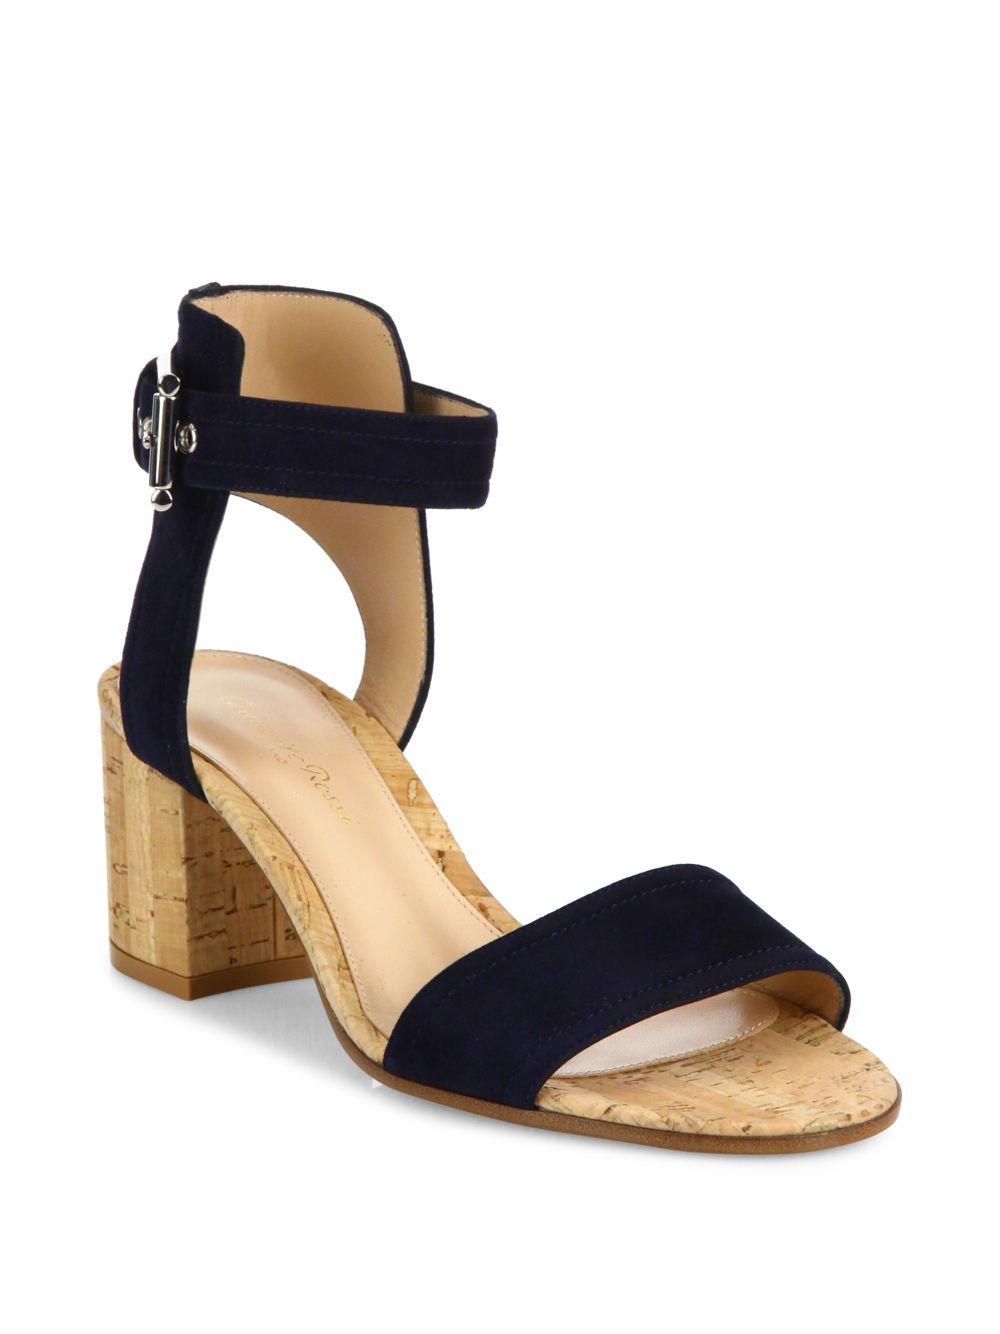 affaf886650 Gianvito Rossi Suede Cork Heel City Sandals in Orange - Lyst